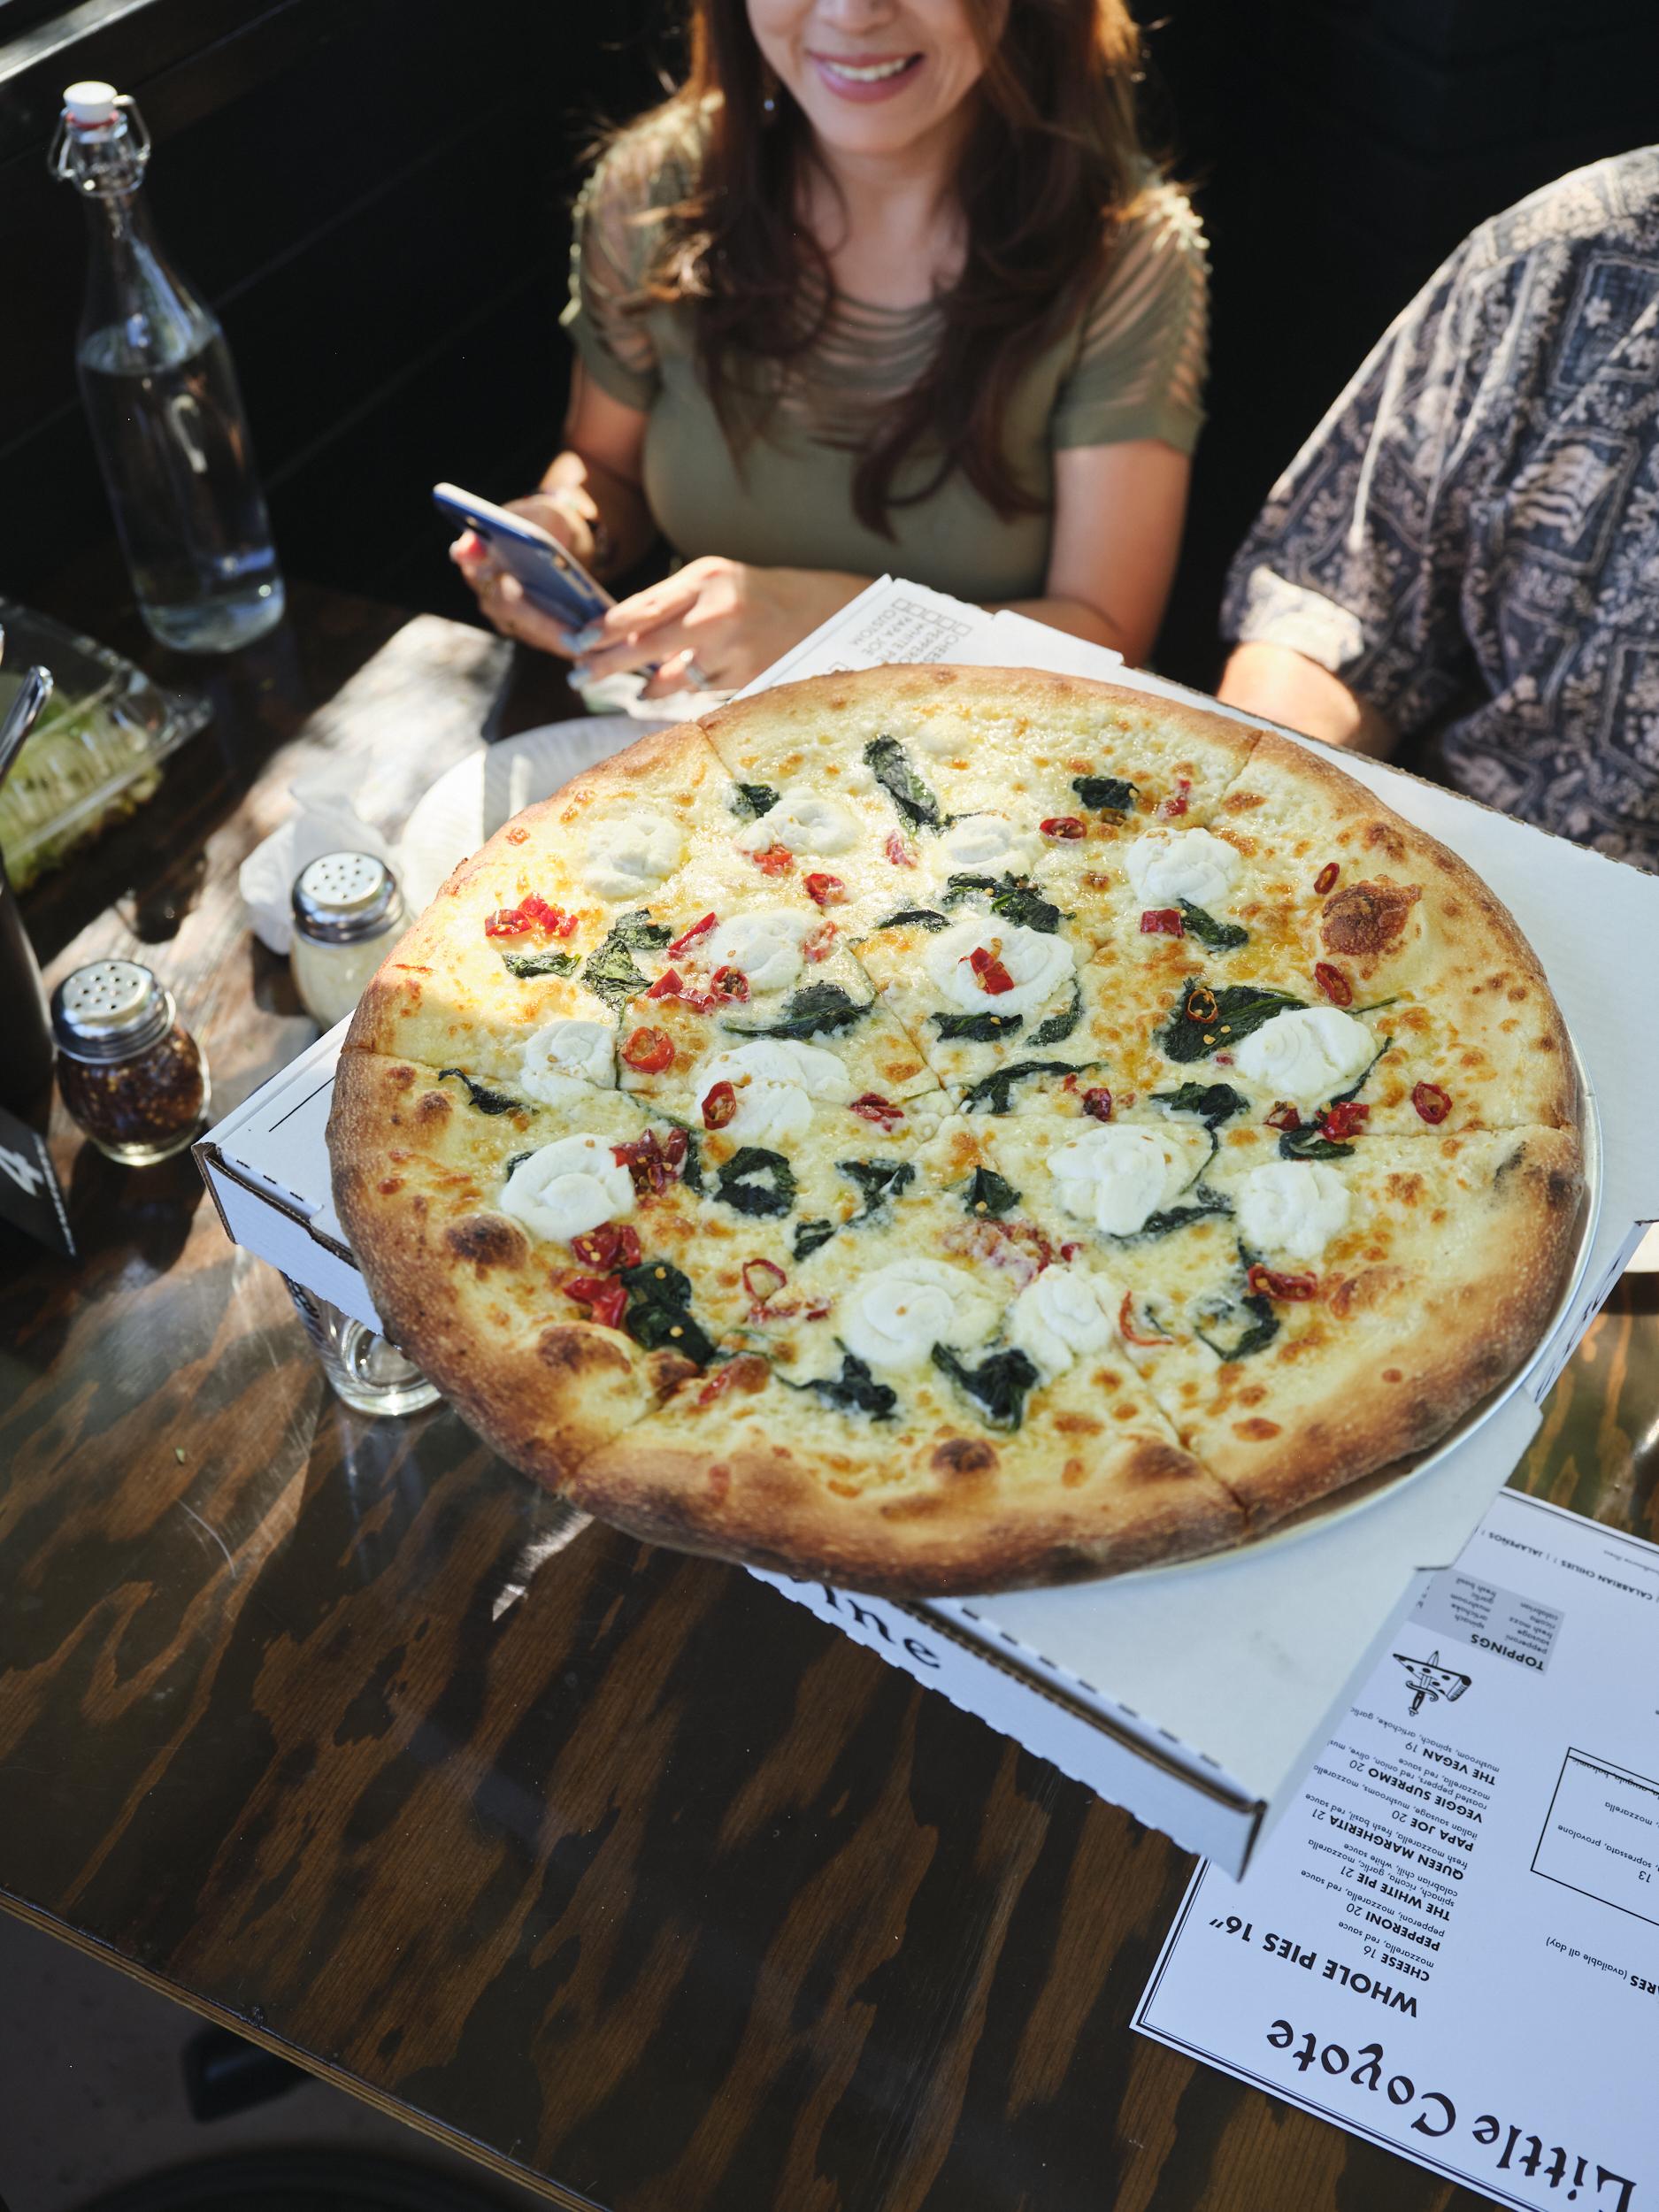 Little Coyote pizza in Long Beach, California